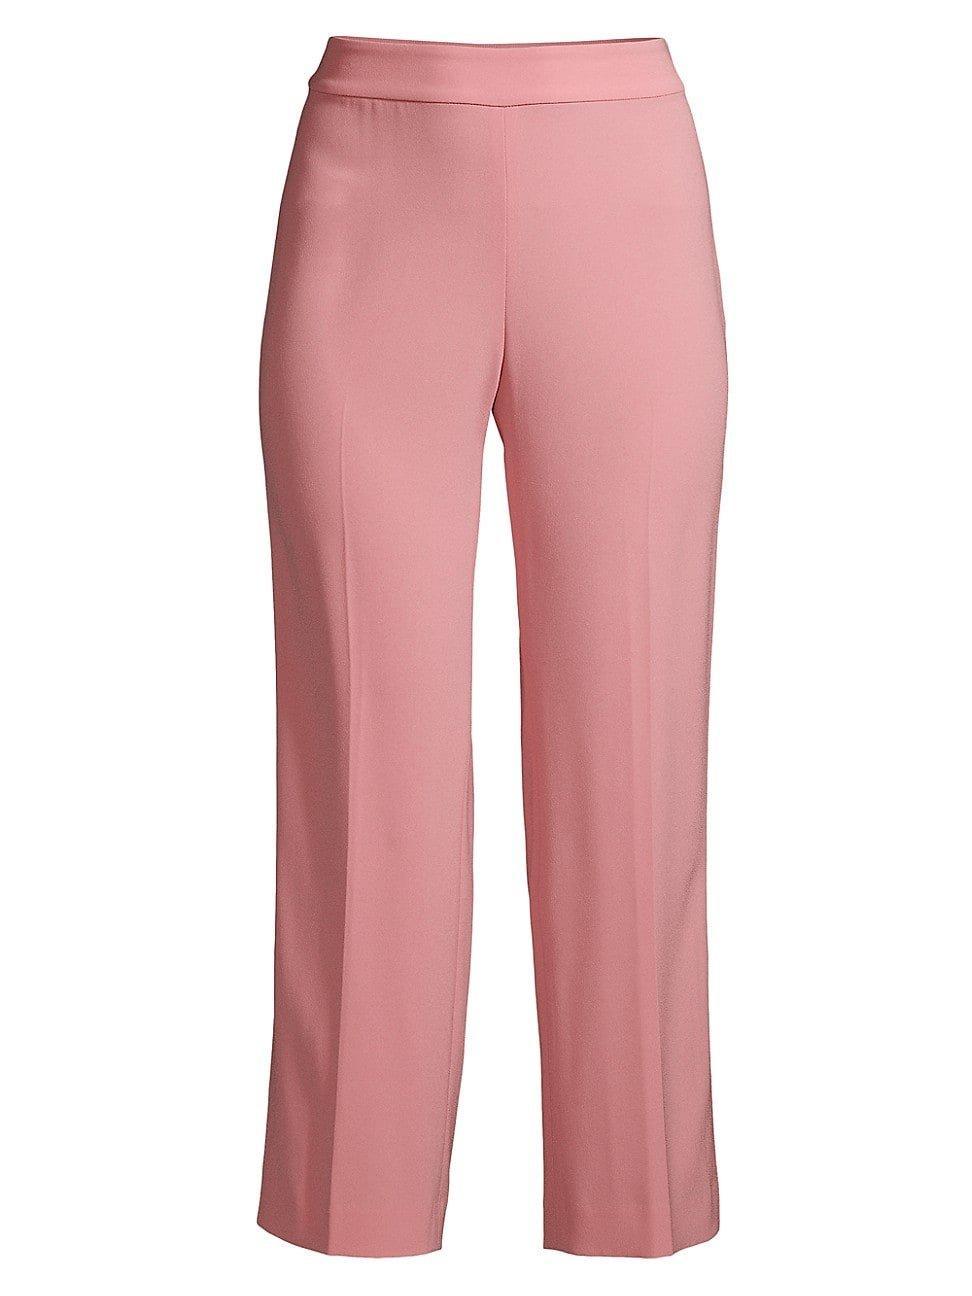 Isabella Cropped Soft Pant